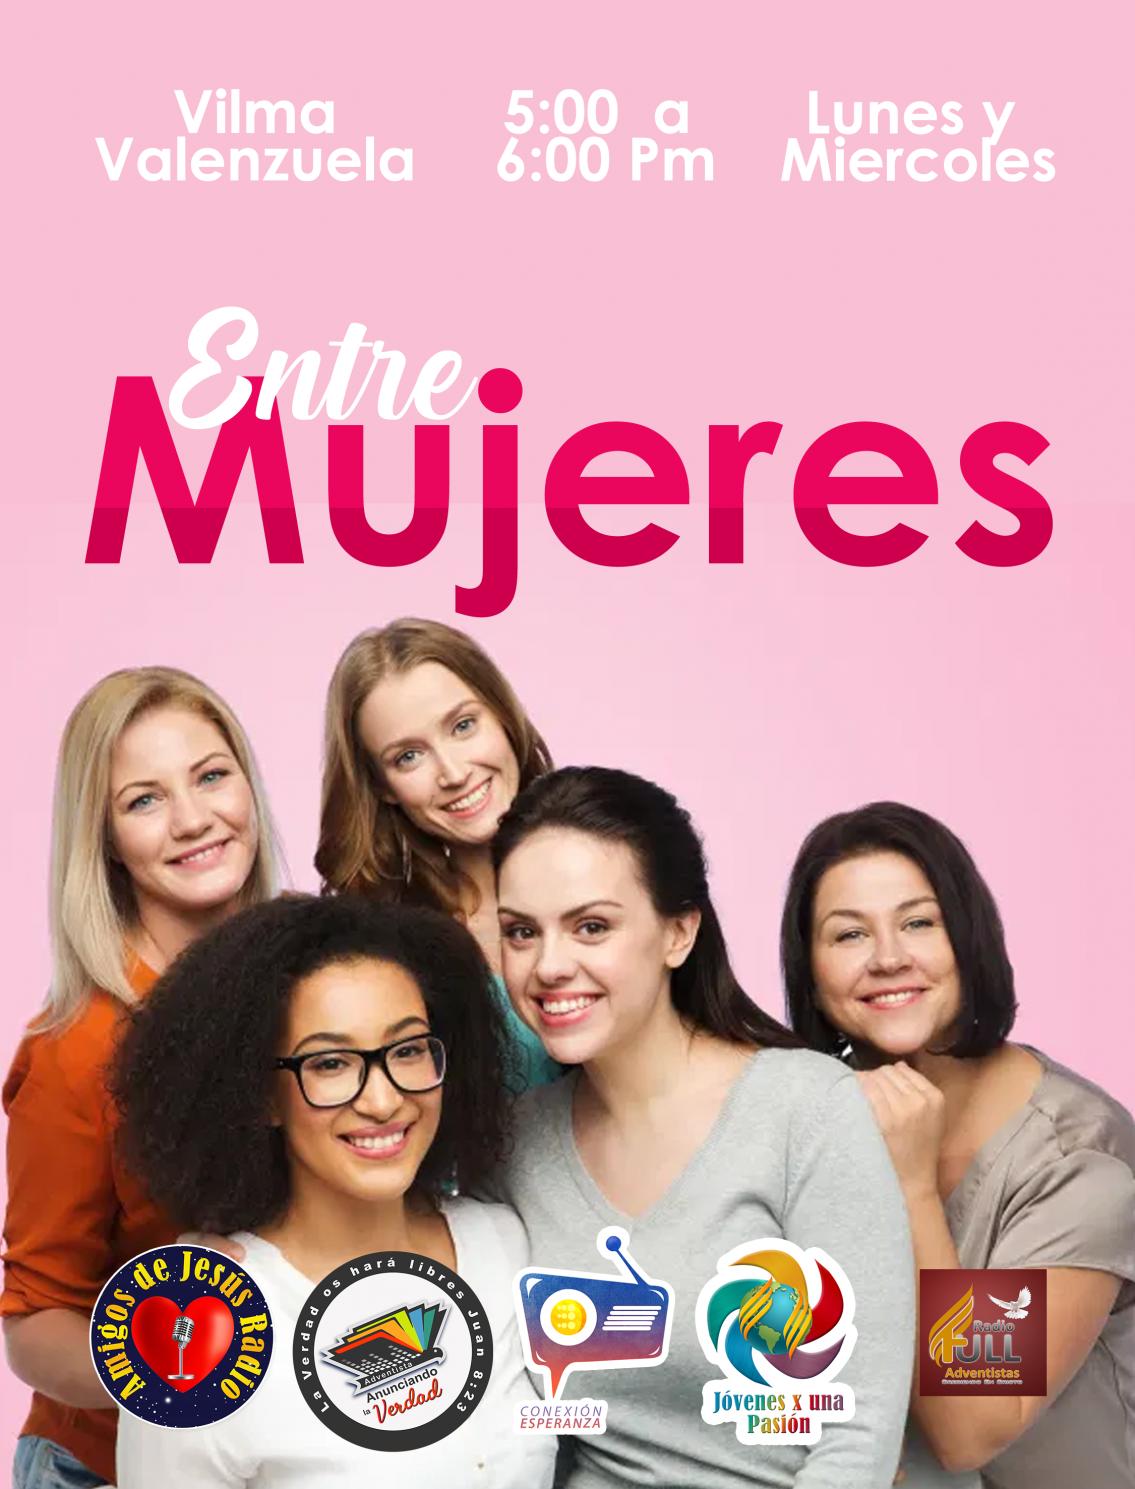 ENTRE MUJERES- VILMA VALENZUELA